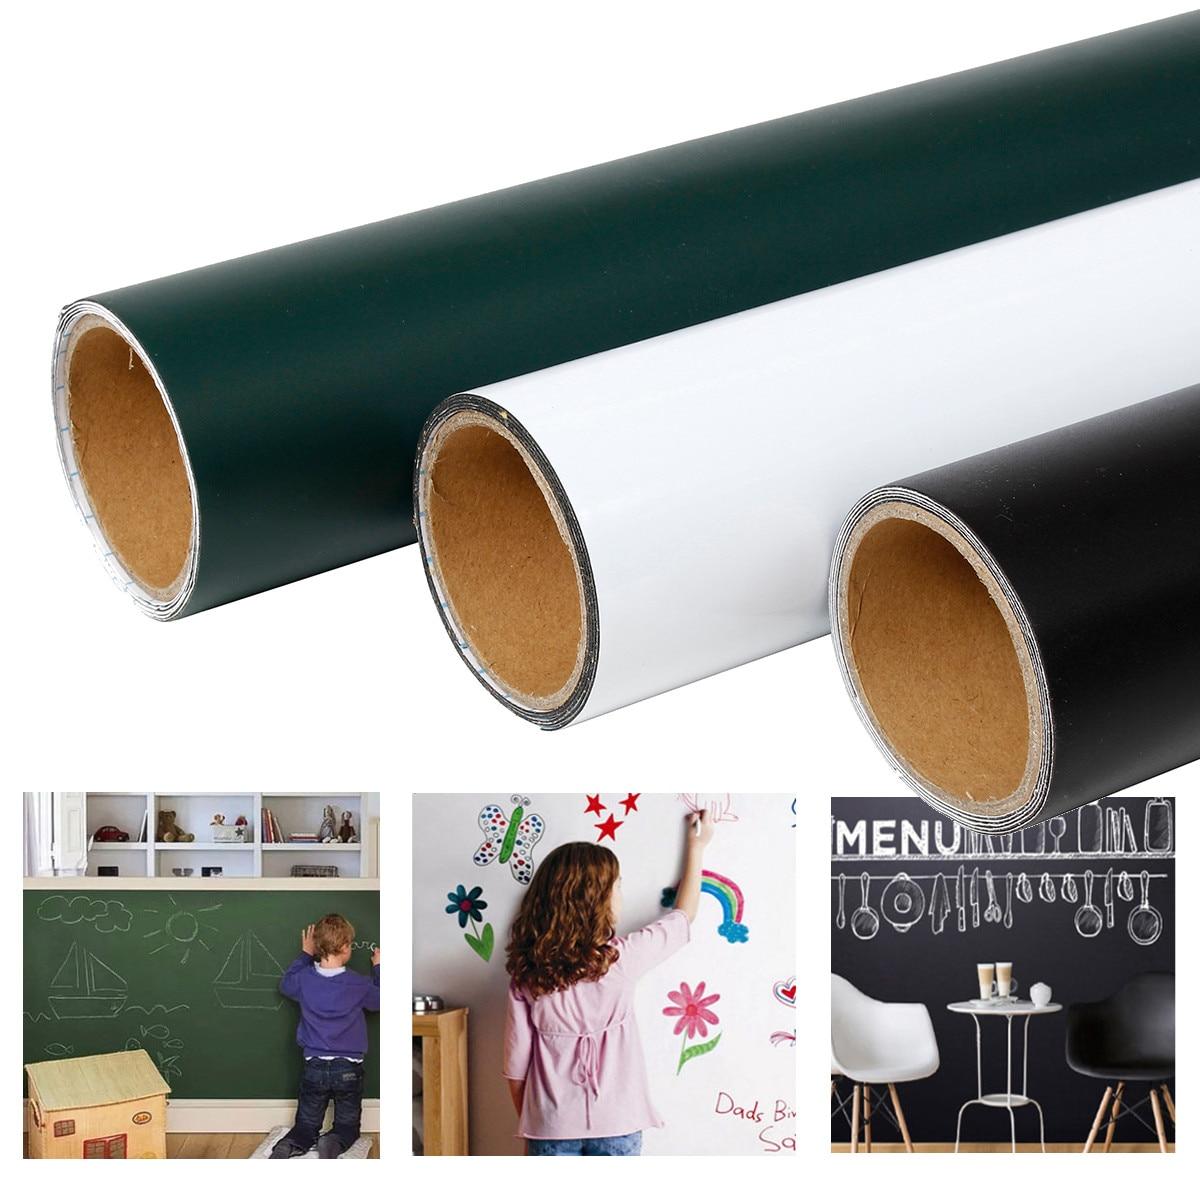 Soft Magnetic Self-adhesive Blackboard Stickers Removable Children Graffiti Wall Stickers Office Presentation Boards Whiteboard